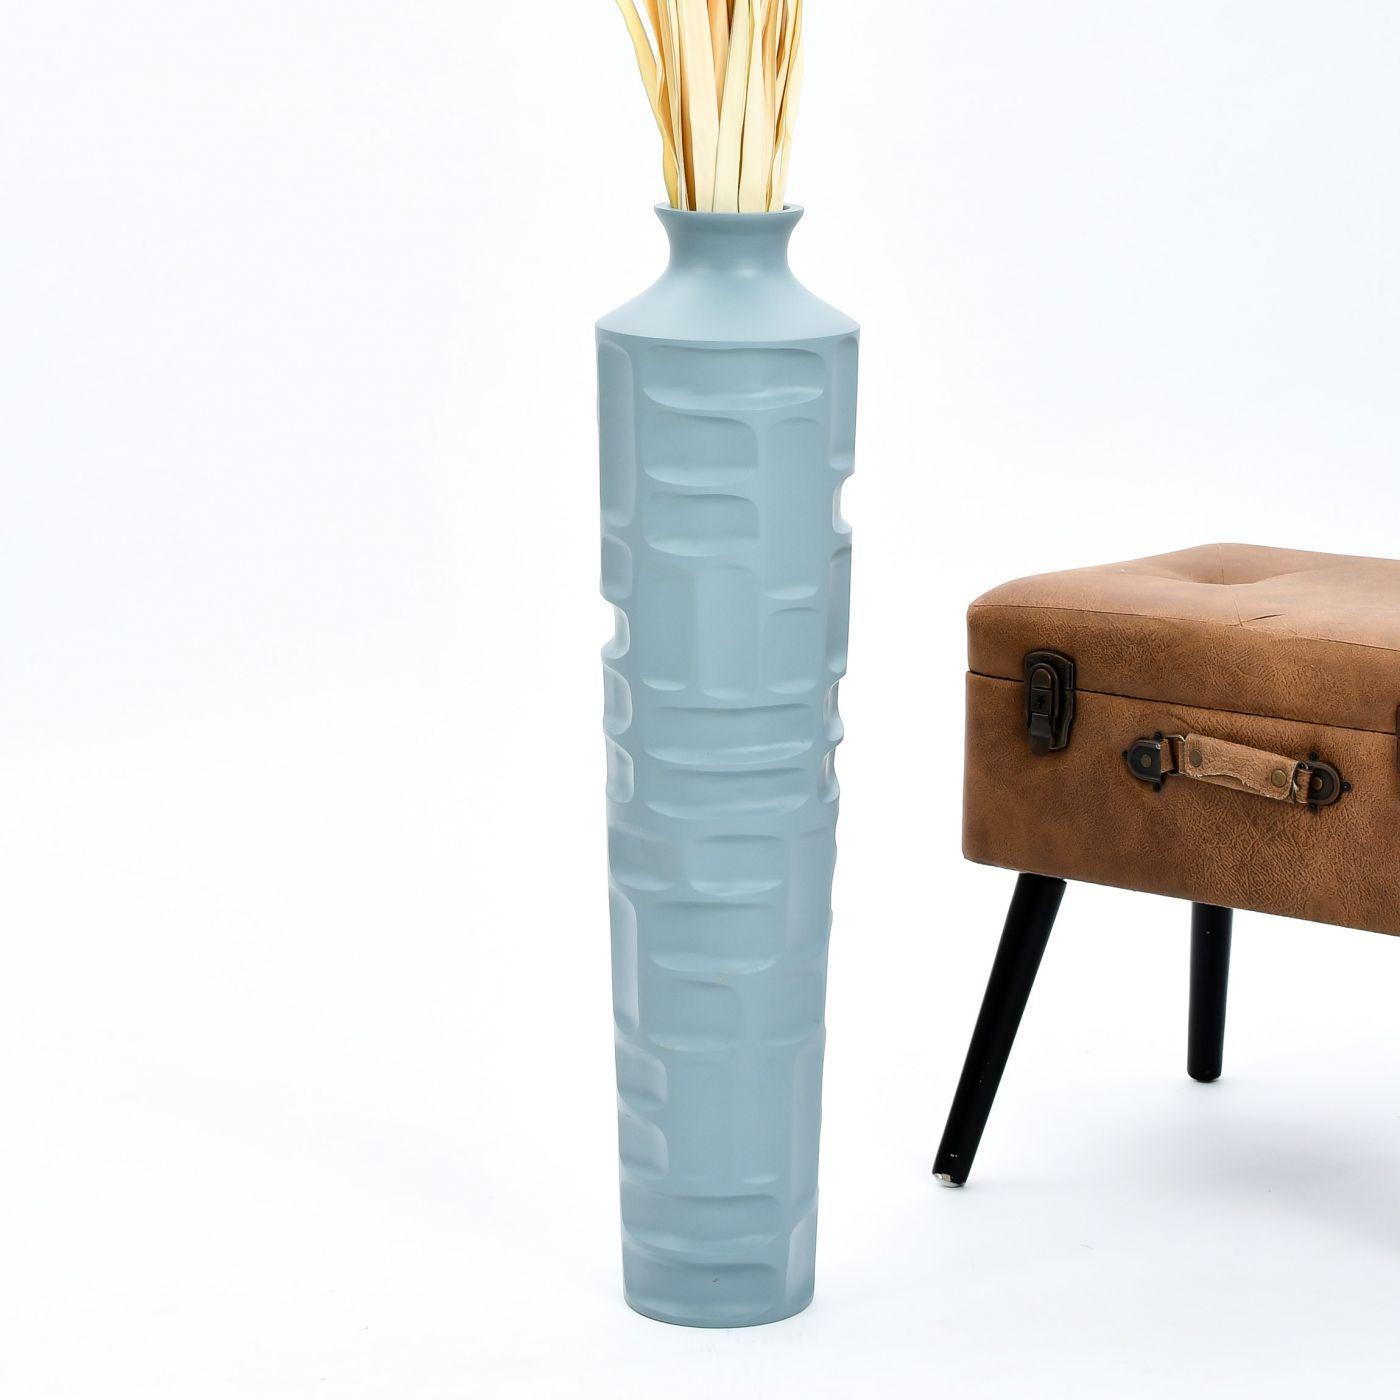 Madera de Mango Leewadee Jarr/ón De Suelo Grande para Ramas Secas Decorativas Florero Alto De Piso Decoraci/ón Casa 90 cm Azul